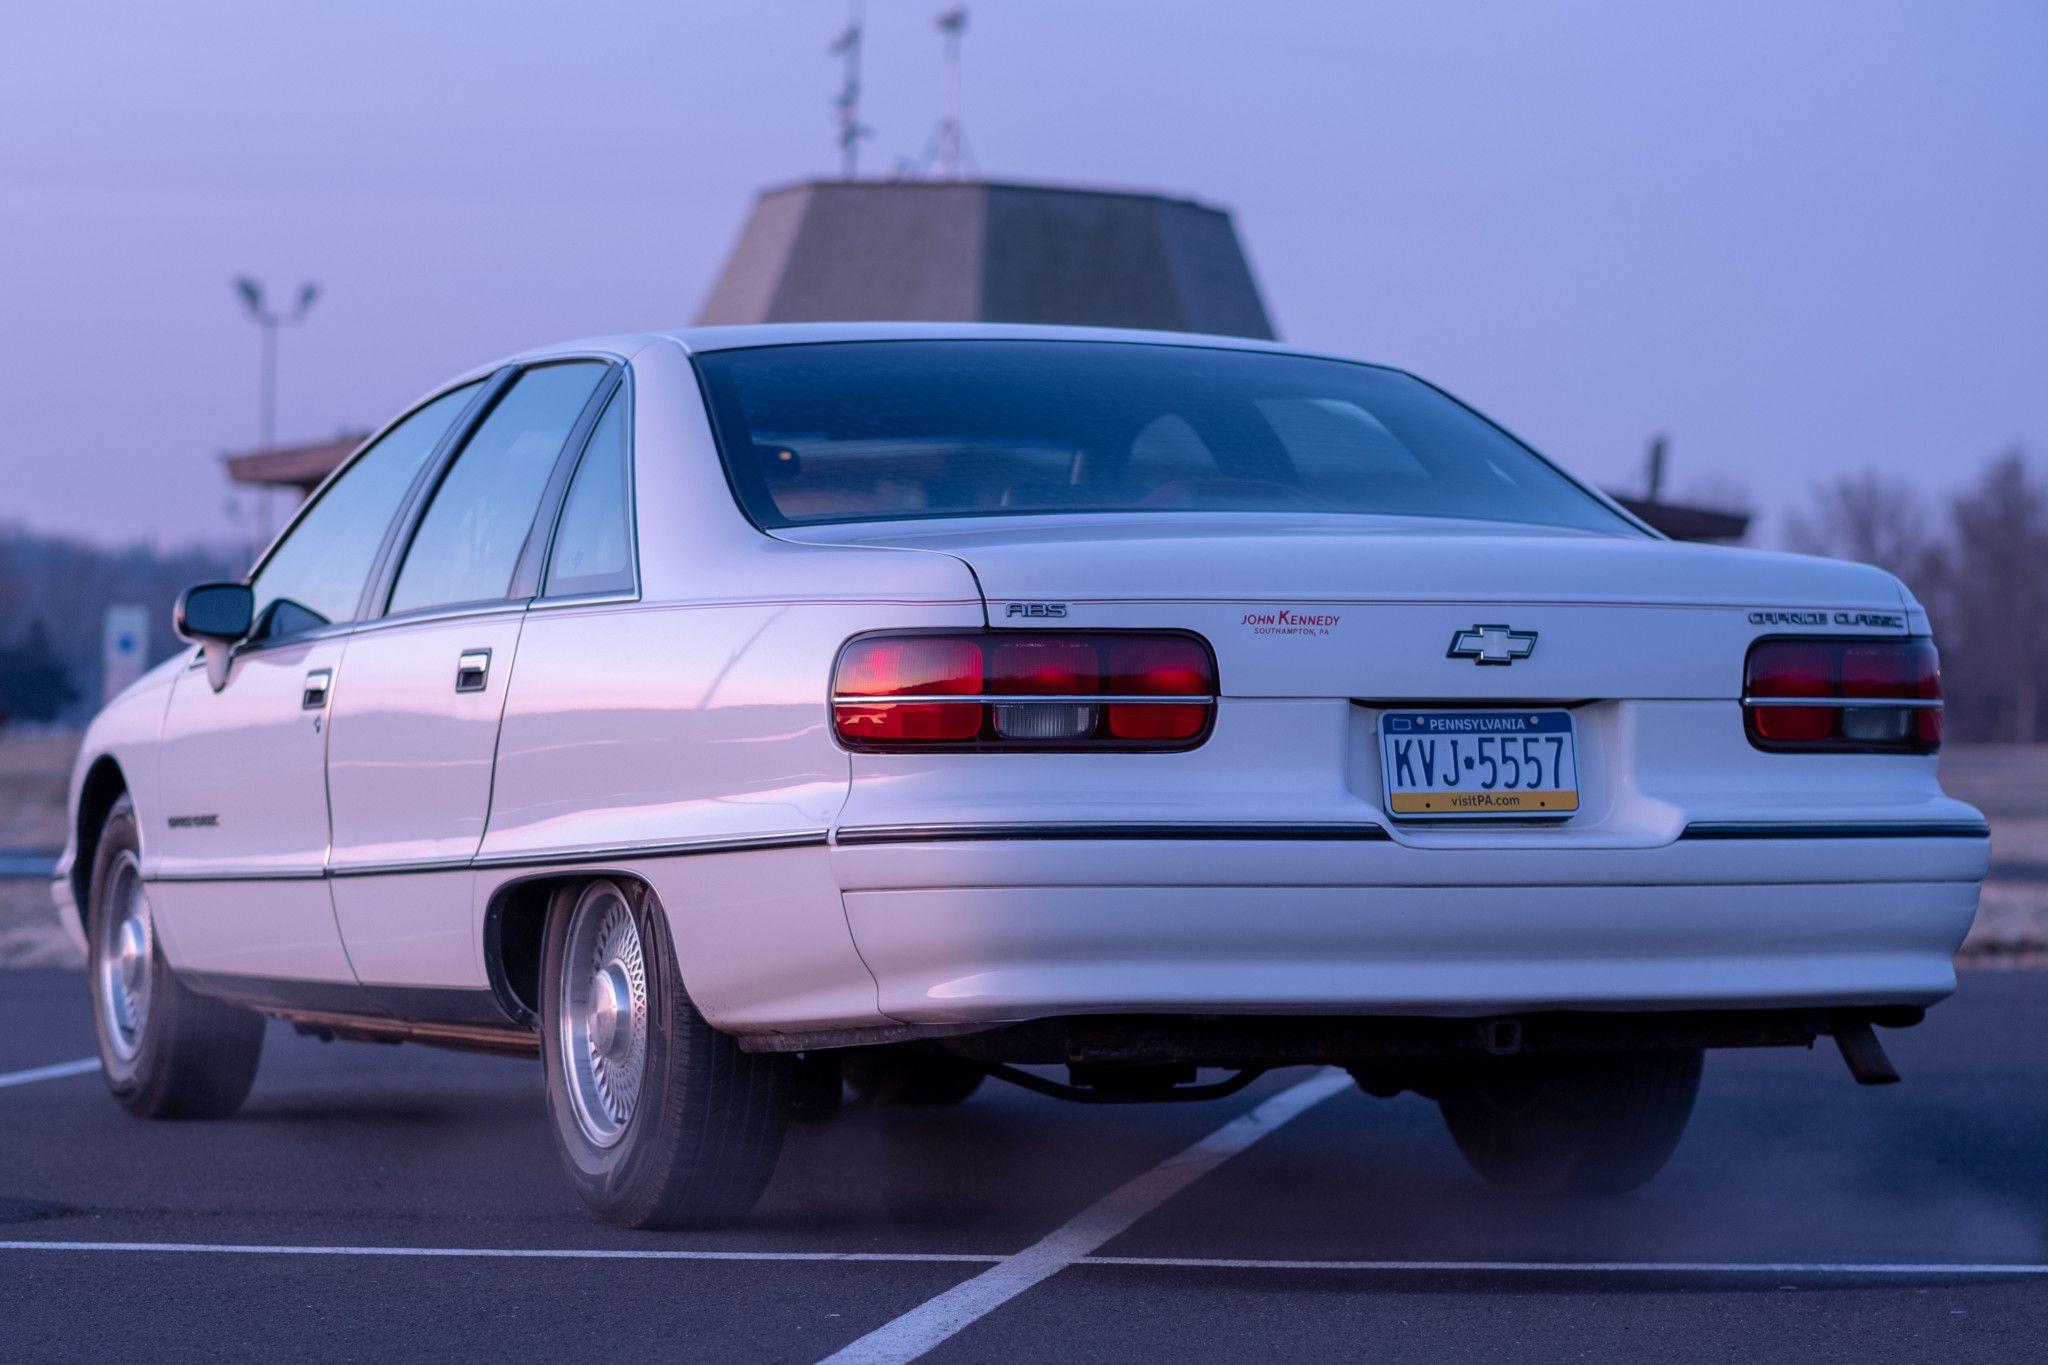 No Reserve 1991 Chevrolet Caprice Classic Chevrolet Caprice Caprice Classic Chevrolet